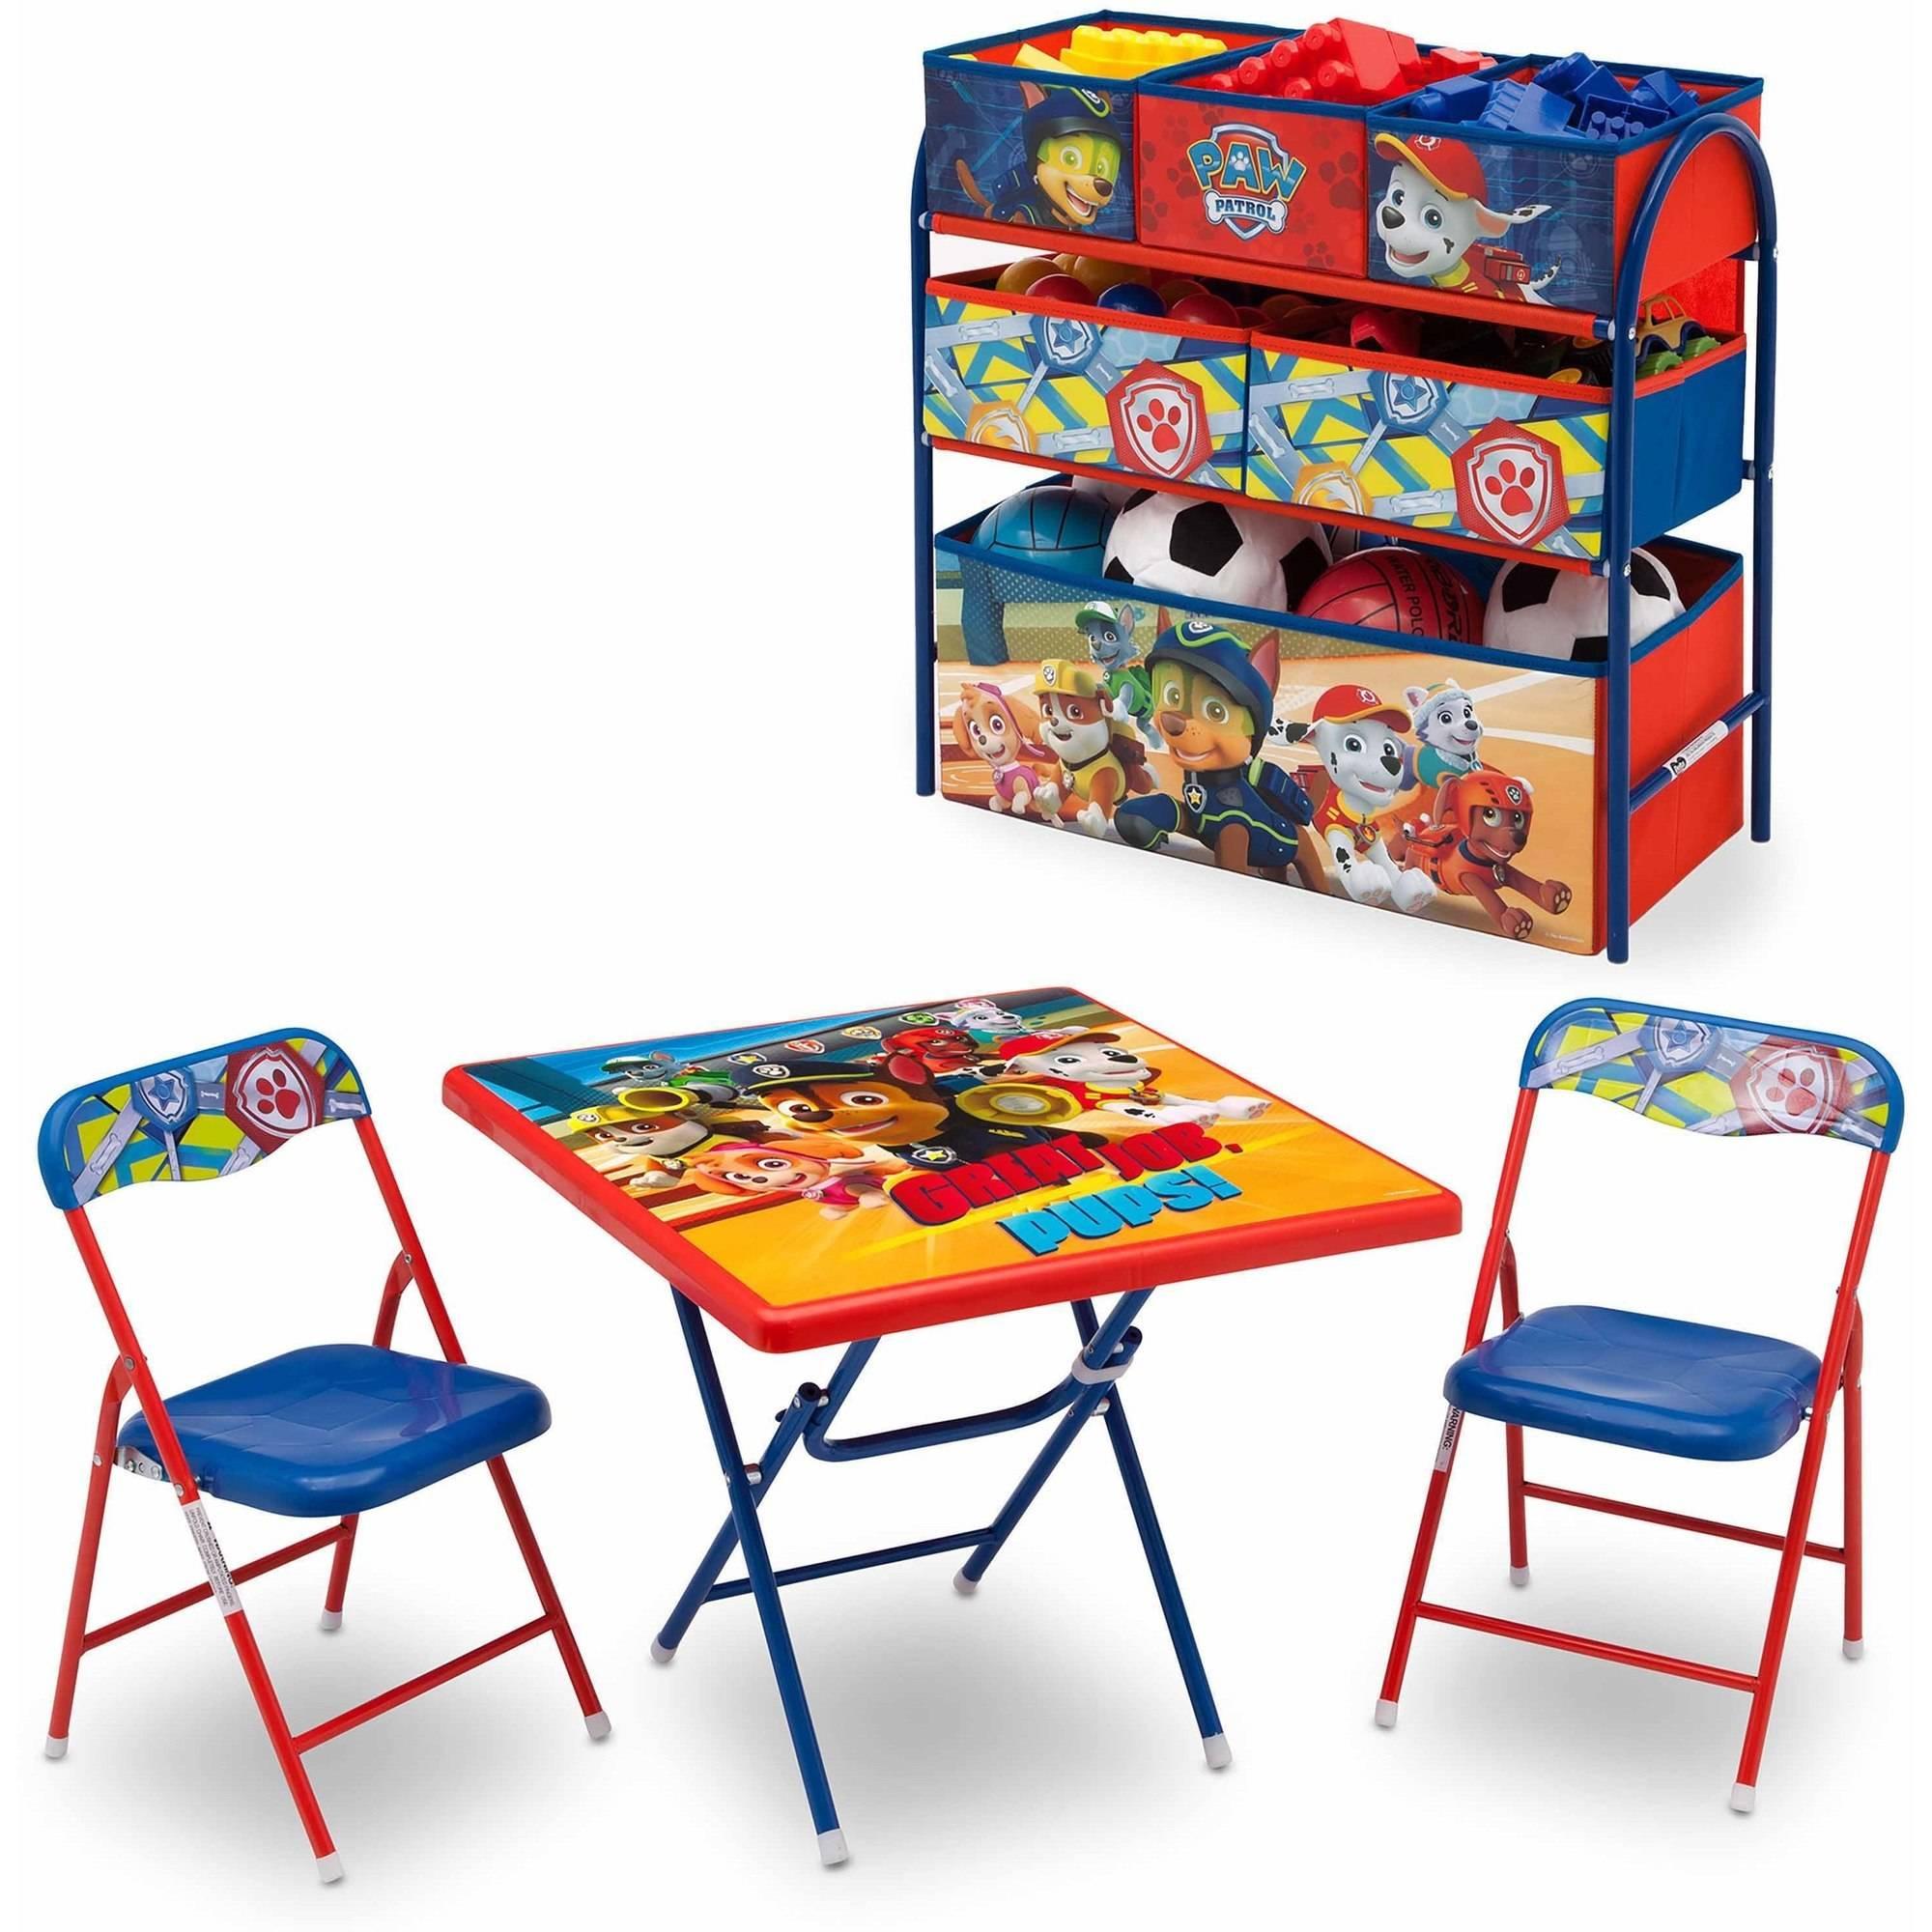 Nick Jr. PAW Patrol Playroom Solution